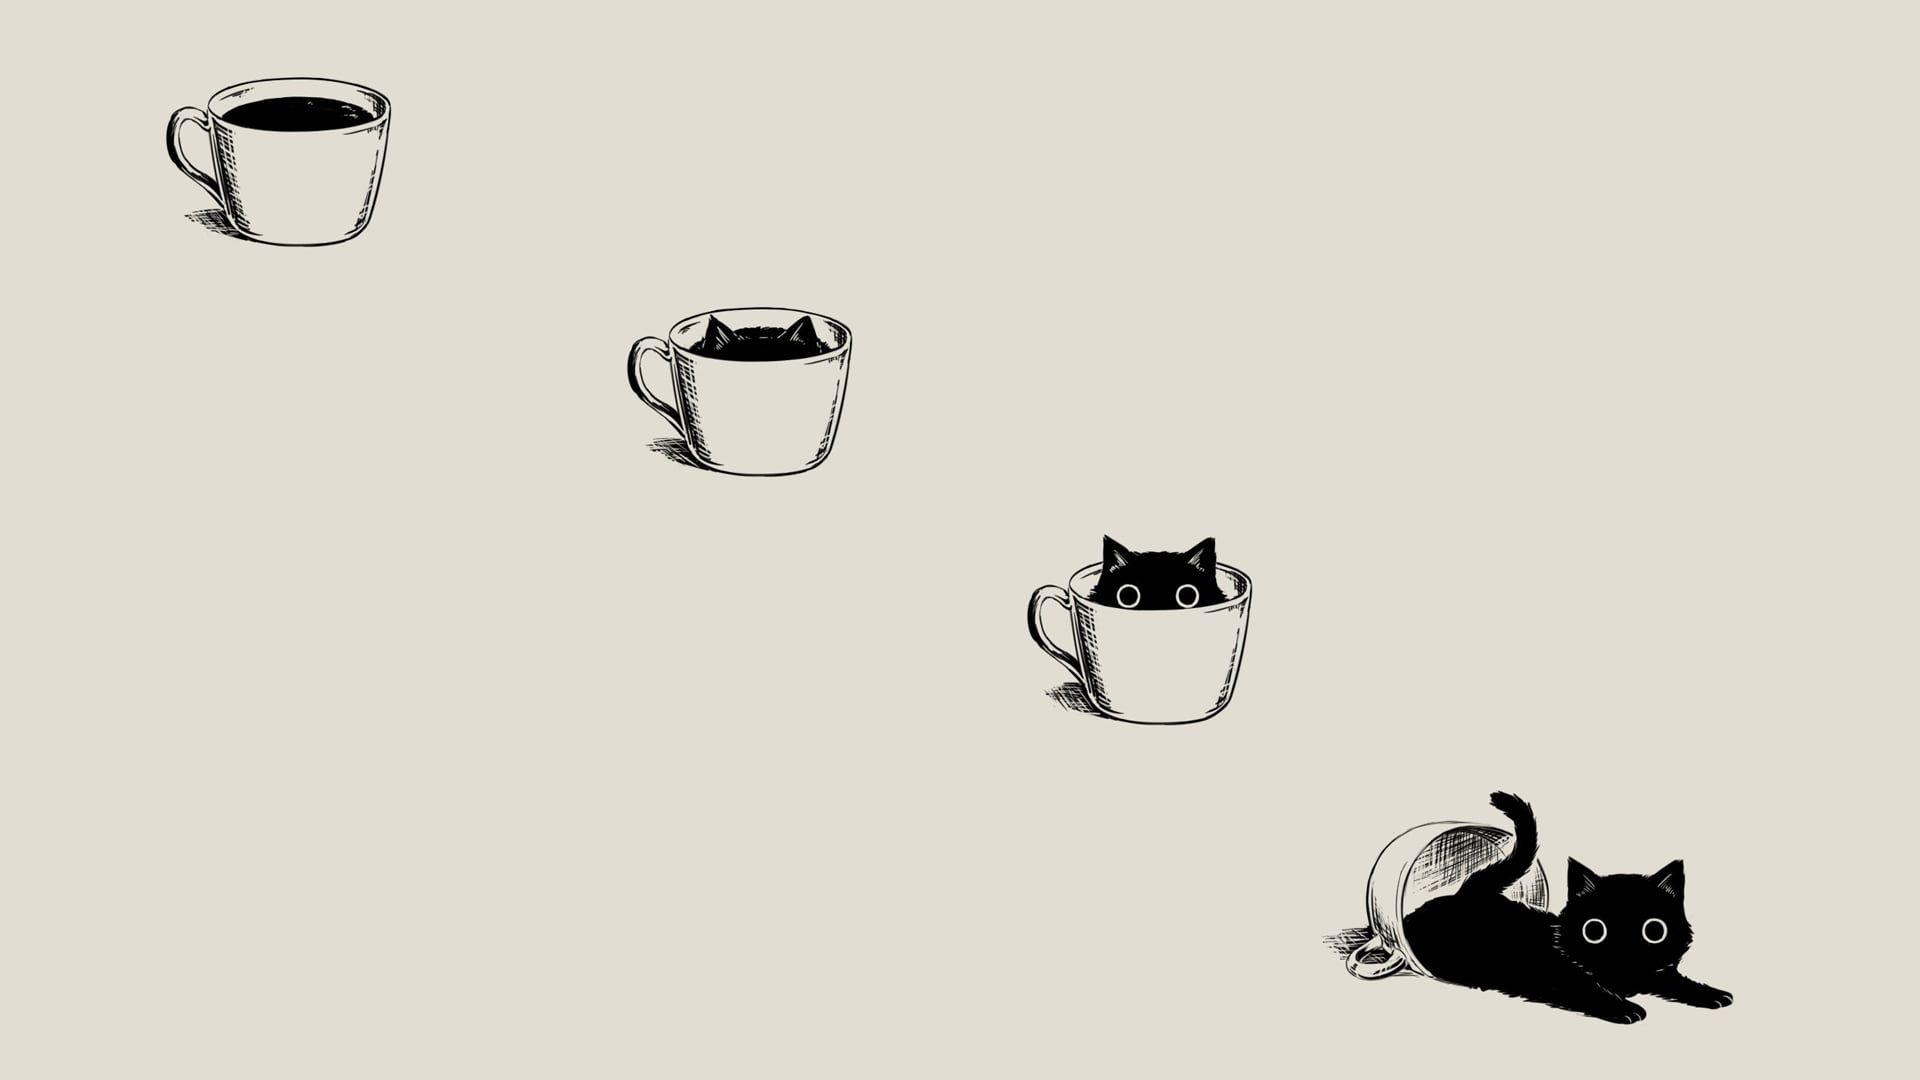 Black Cat On White Cup Clip Art Anime Manga Minimalism Simple Background Coffee Black Cats Beige Cute Cat Wallpaper Cat Wallpaper Desktop Wallpaper Black